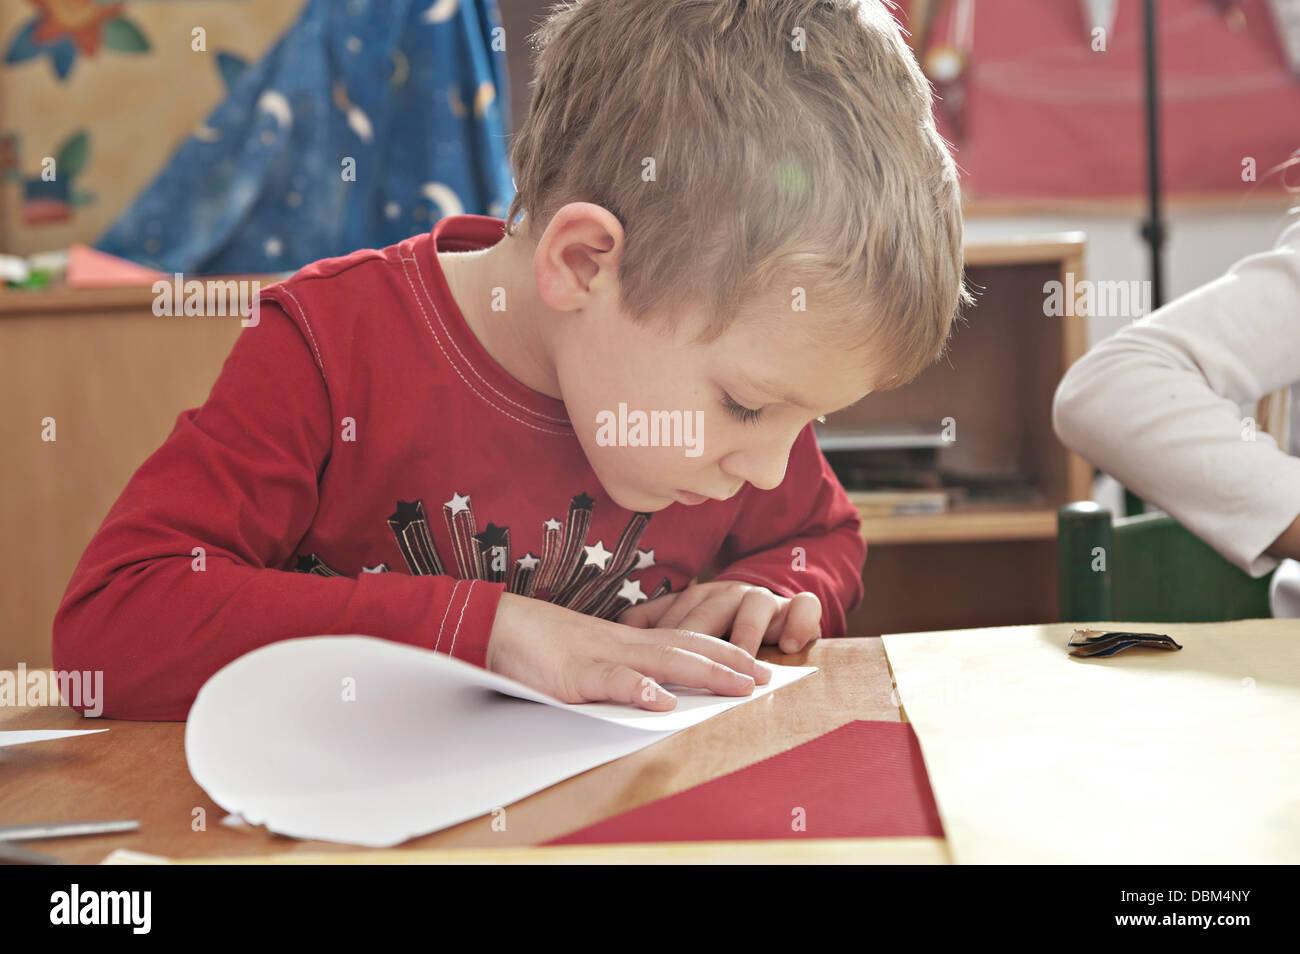 Children In Nursery School Folding Paper Planes, Kottgeisering, Bavaria, Germany, Europe - Stock Image